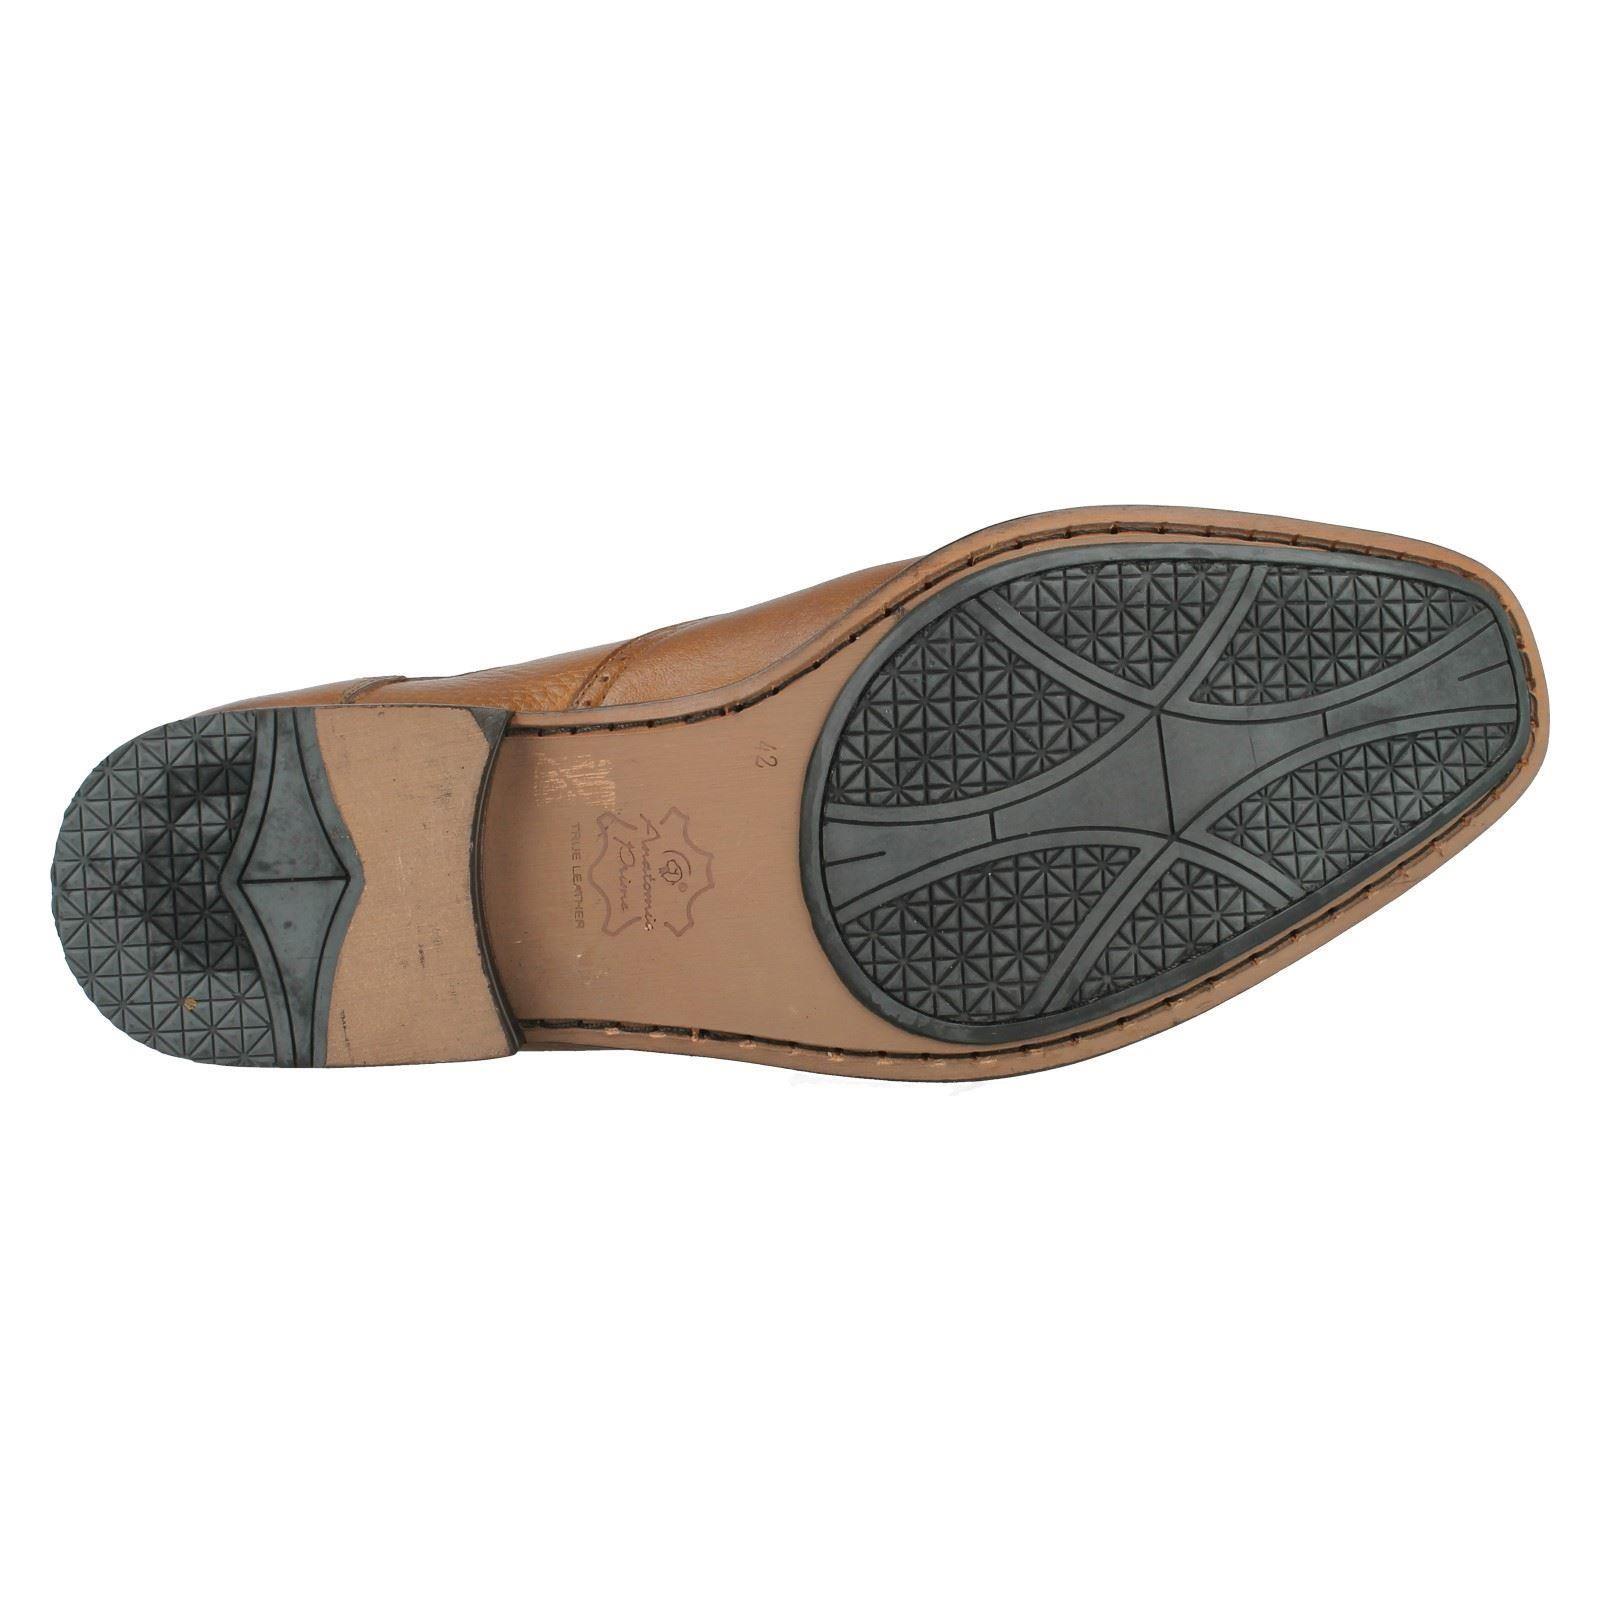 Uomo Anatomic Lace & Co Prime 'Guara' Lace Anatomic Up Schuhes Label  K 9e25f9